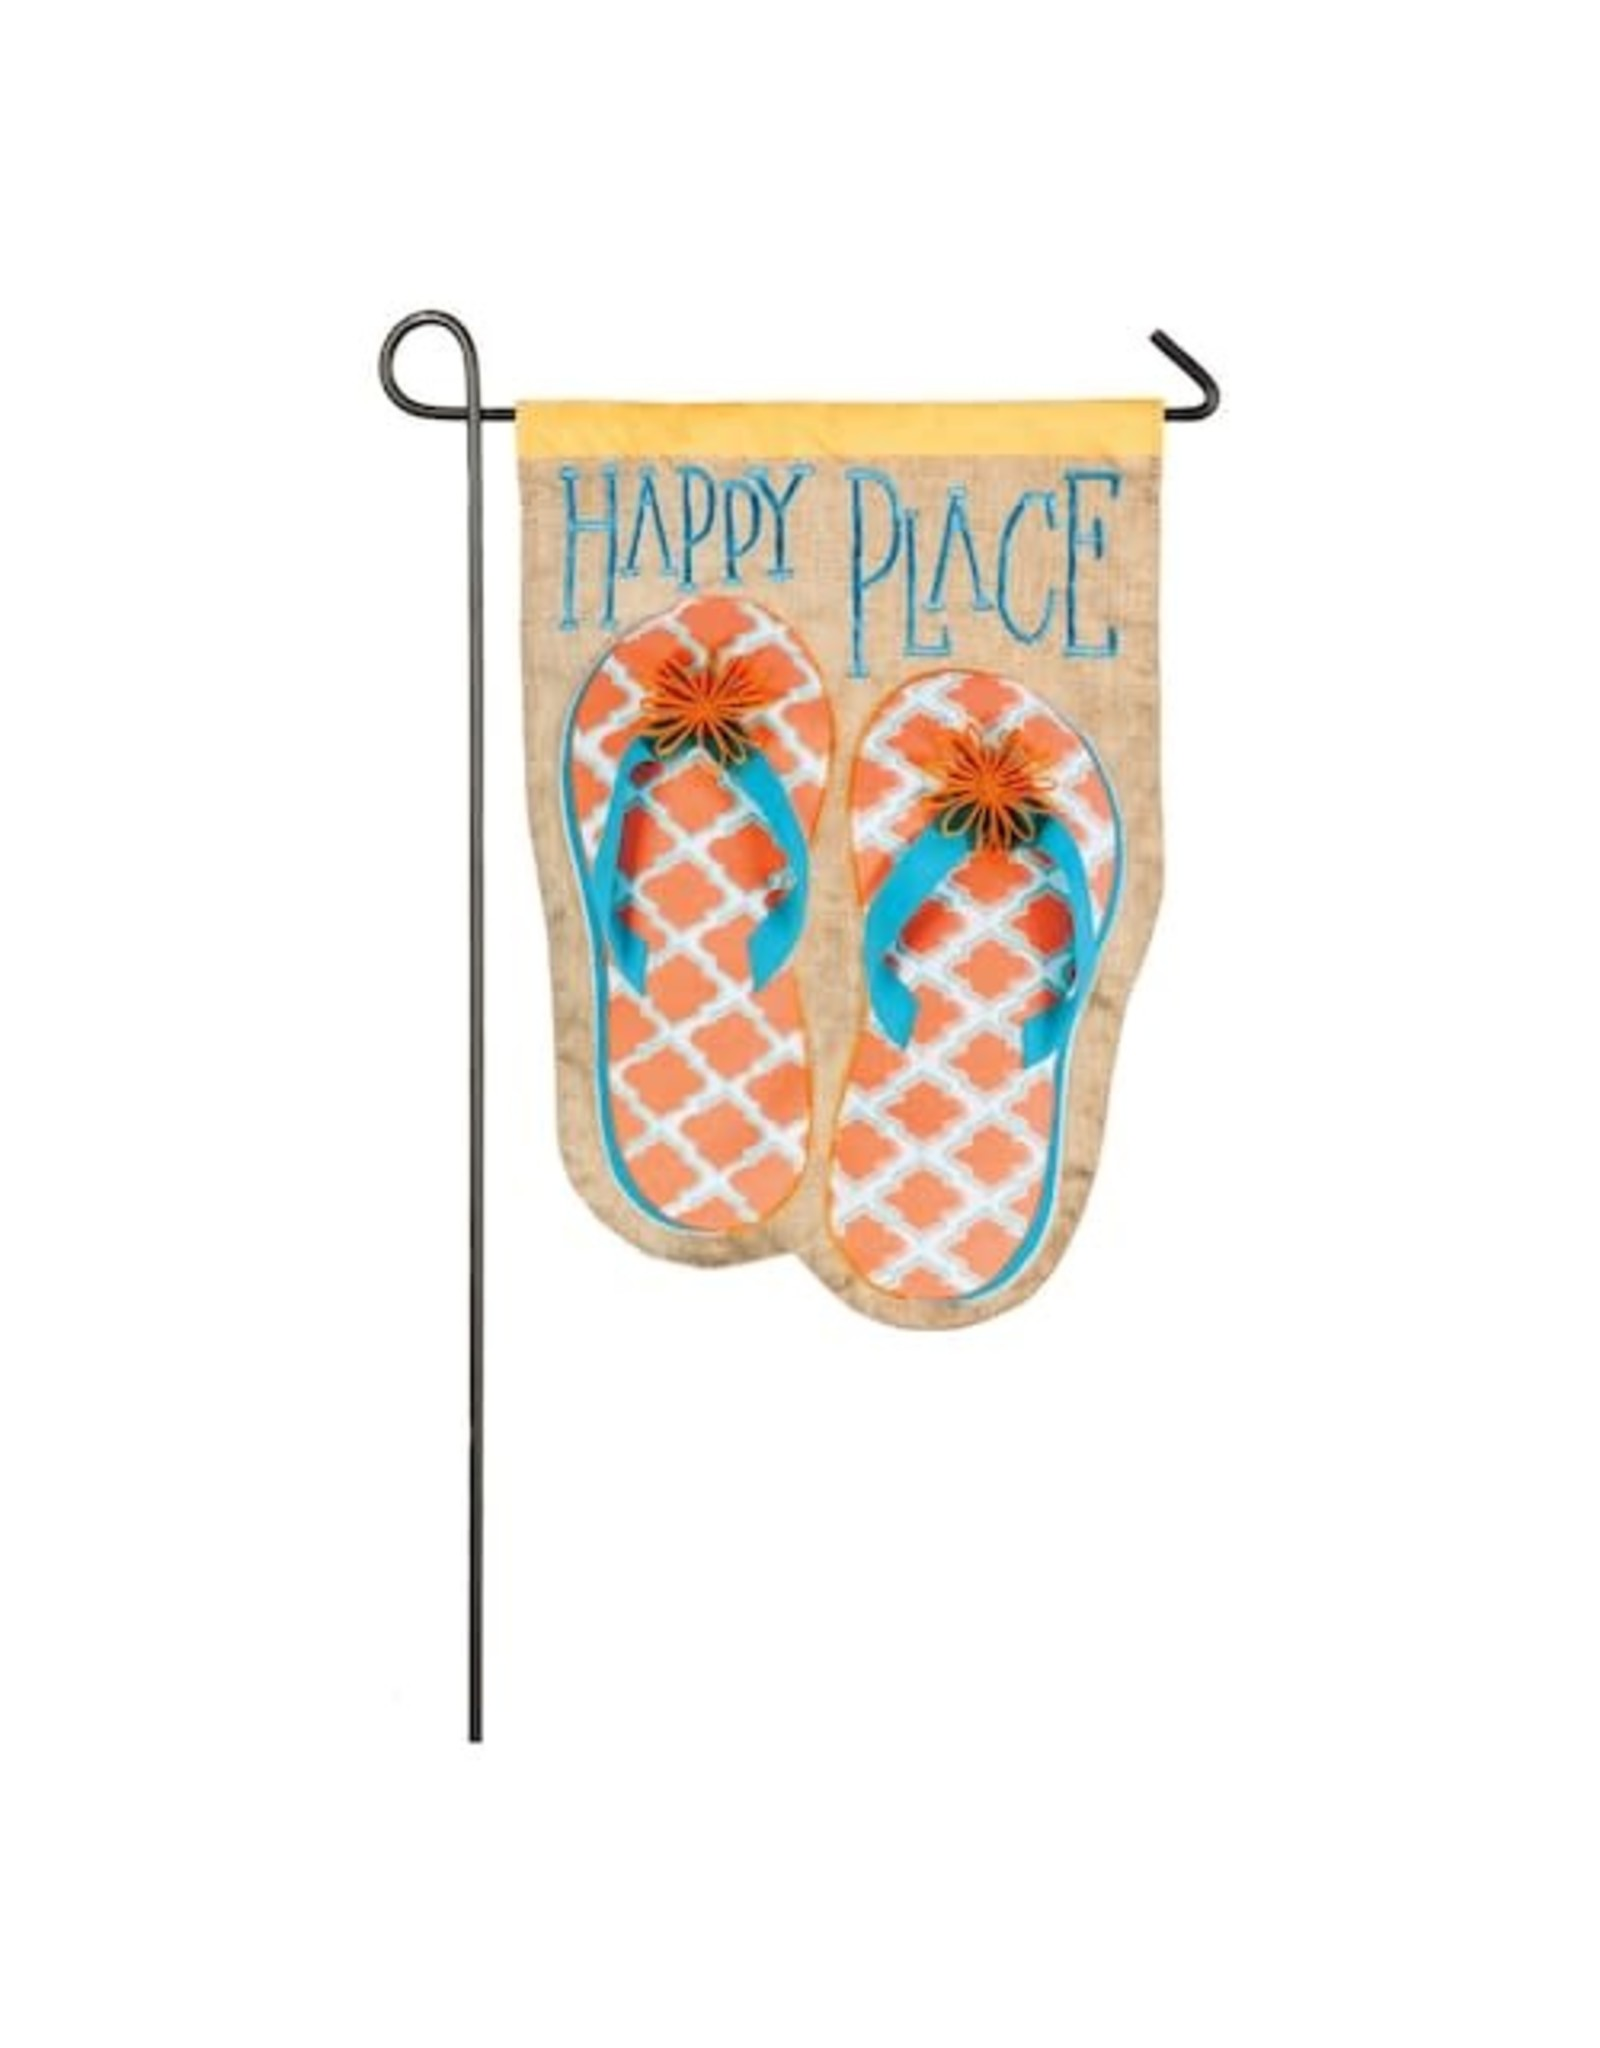 Evergreen Enterprises Happy Place Flip Flops Garden Linen Flag